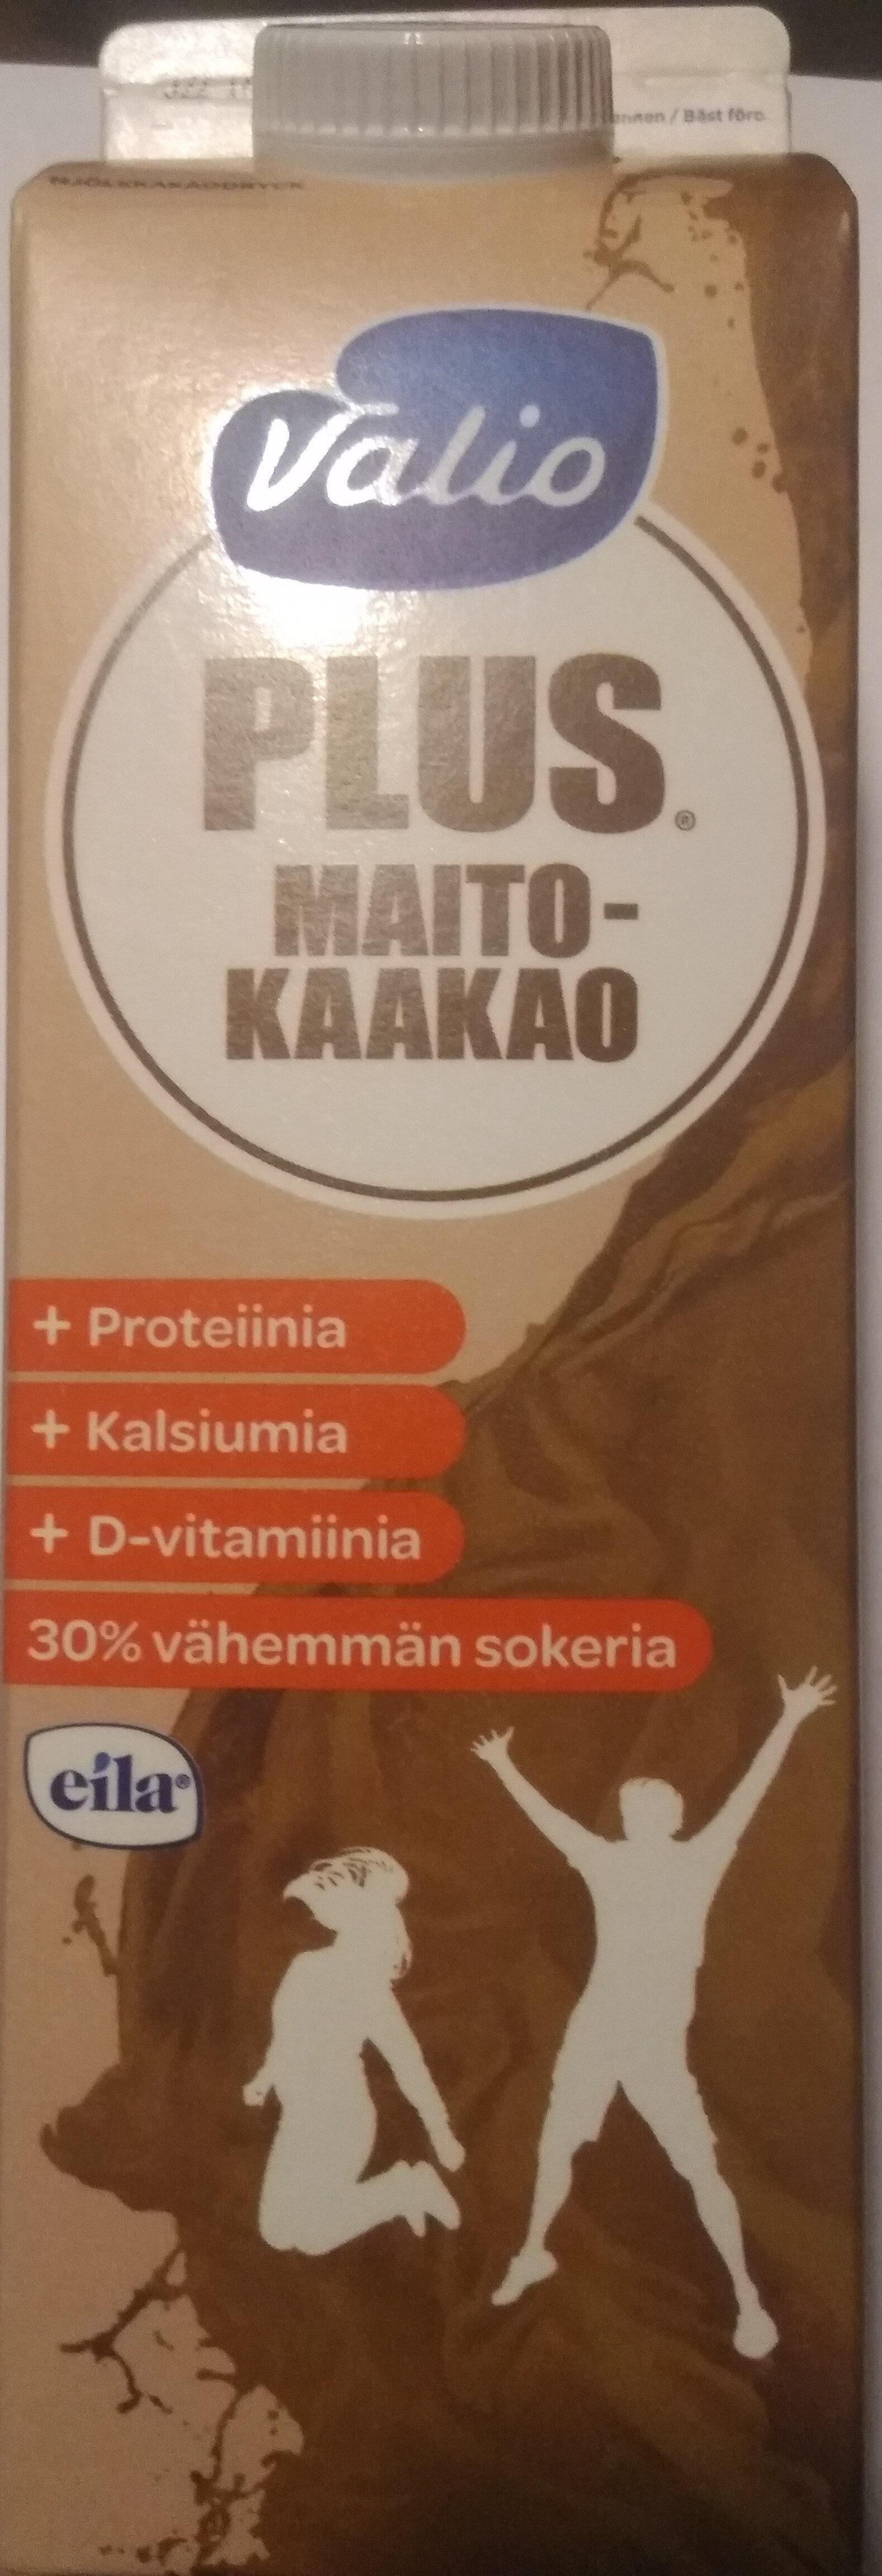 Plus maitokaakaojuoma - Produkt